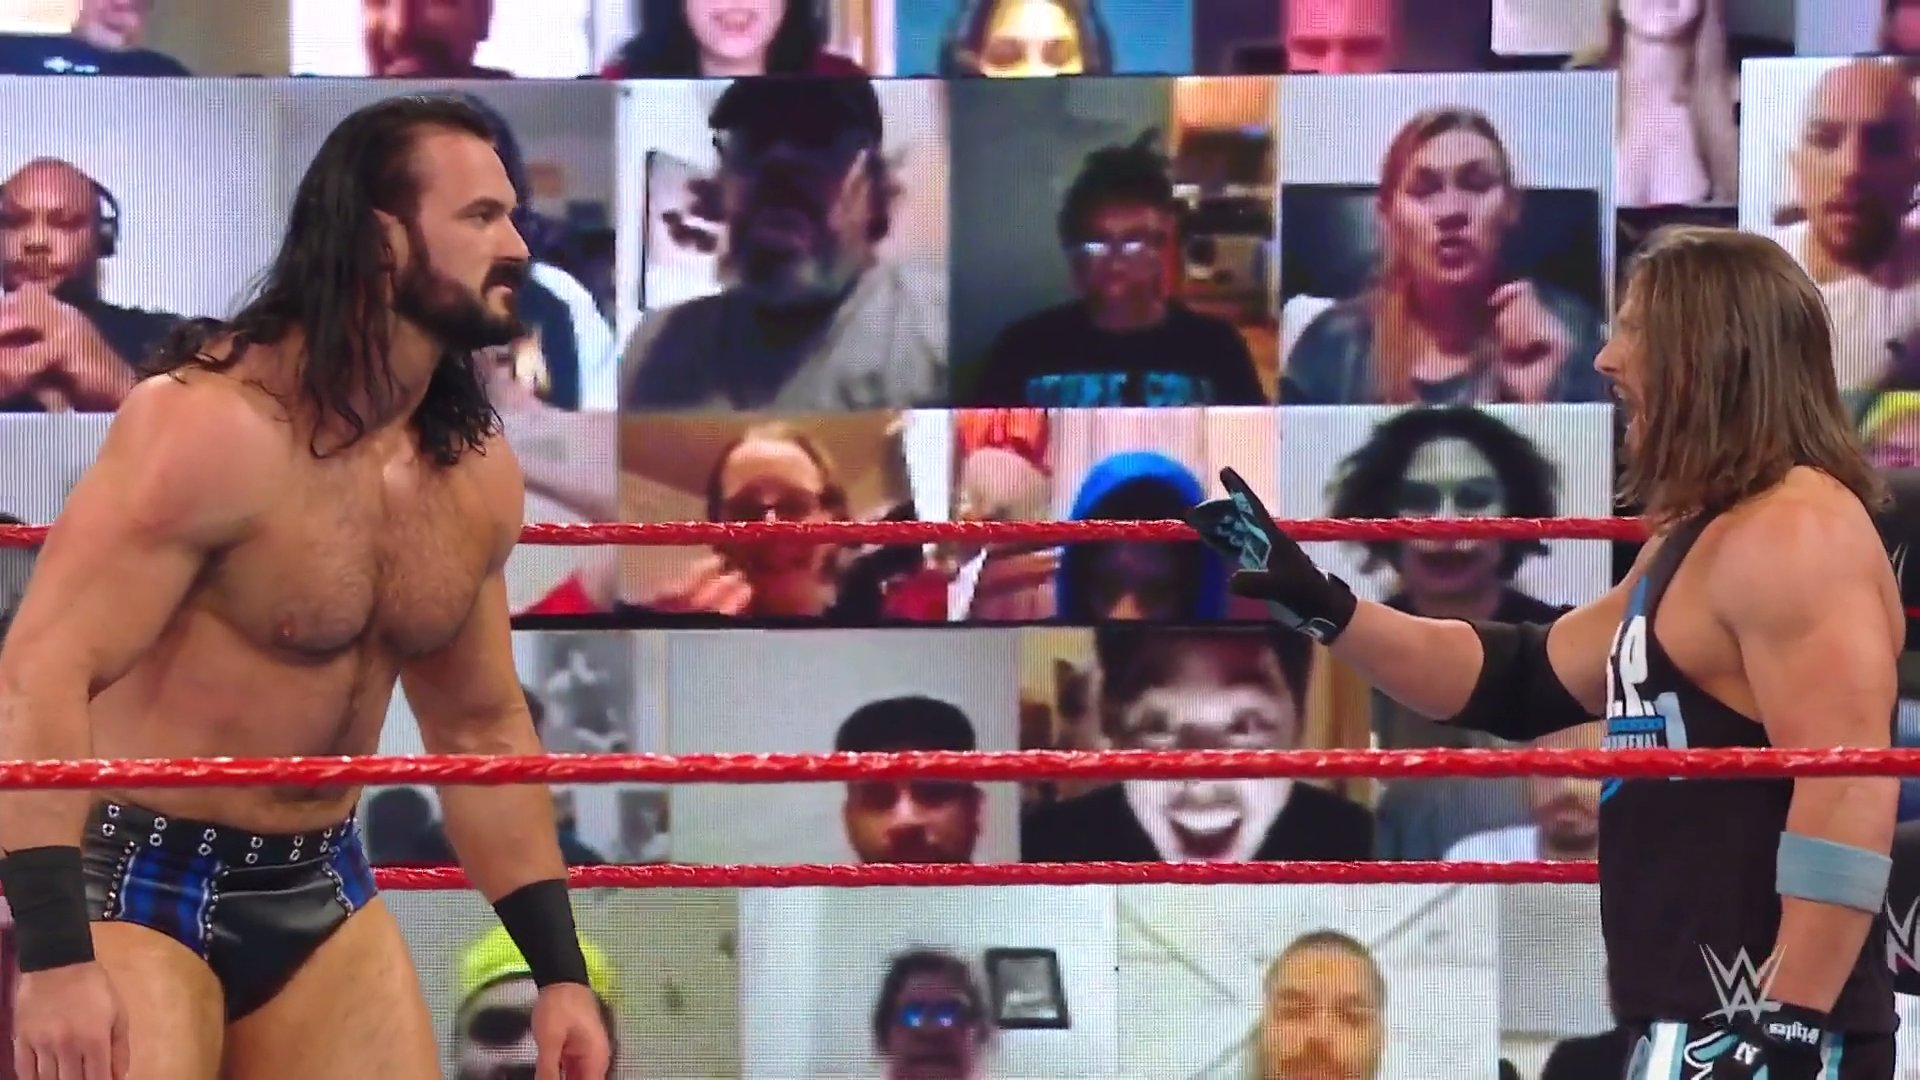 WWE TLC 2020: Drew McIntyre Vs AJ Styles Confirmed For The PPV 2